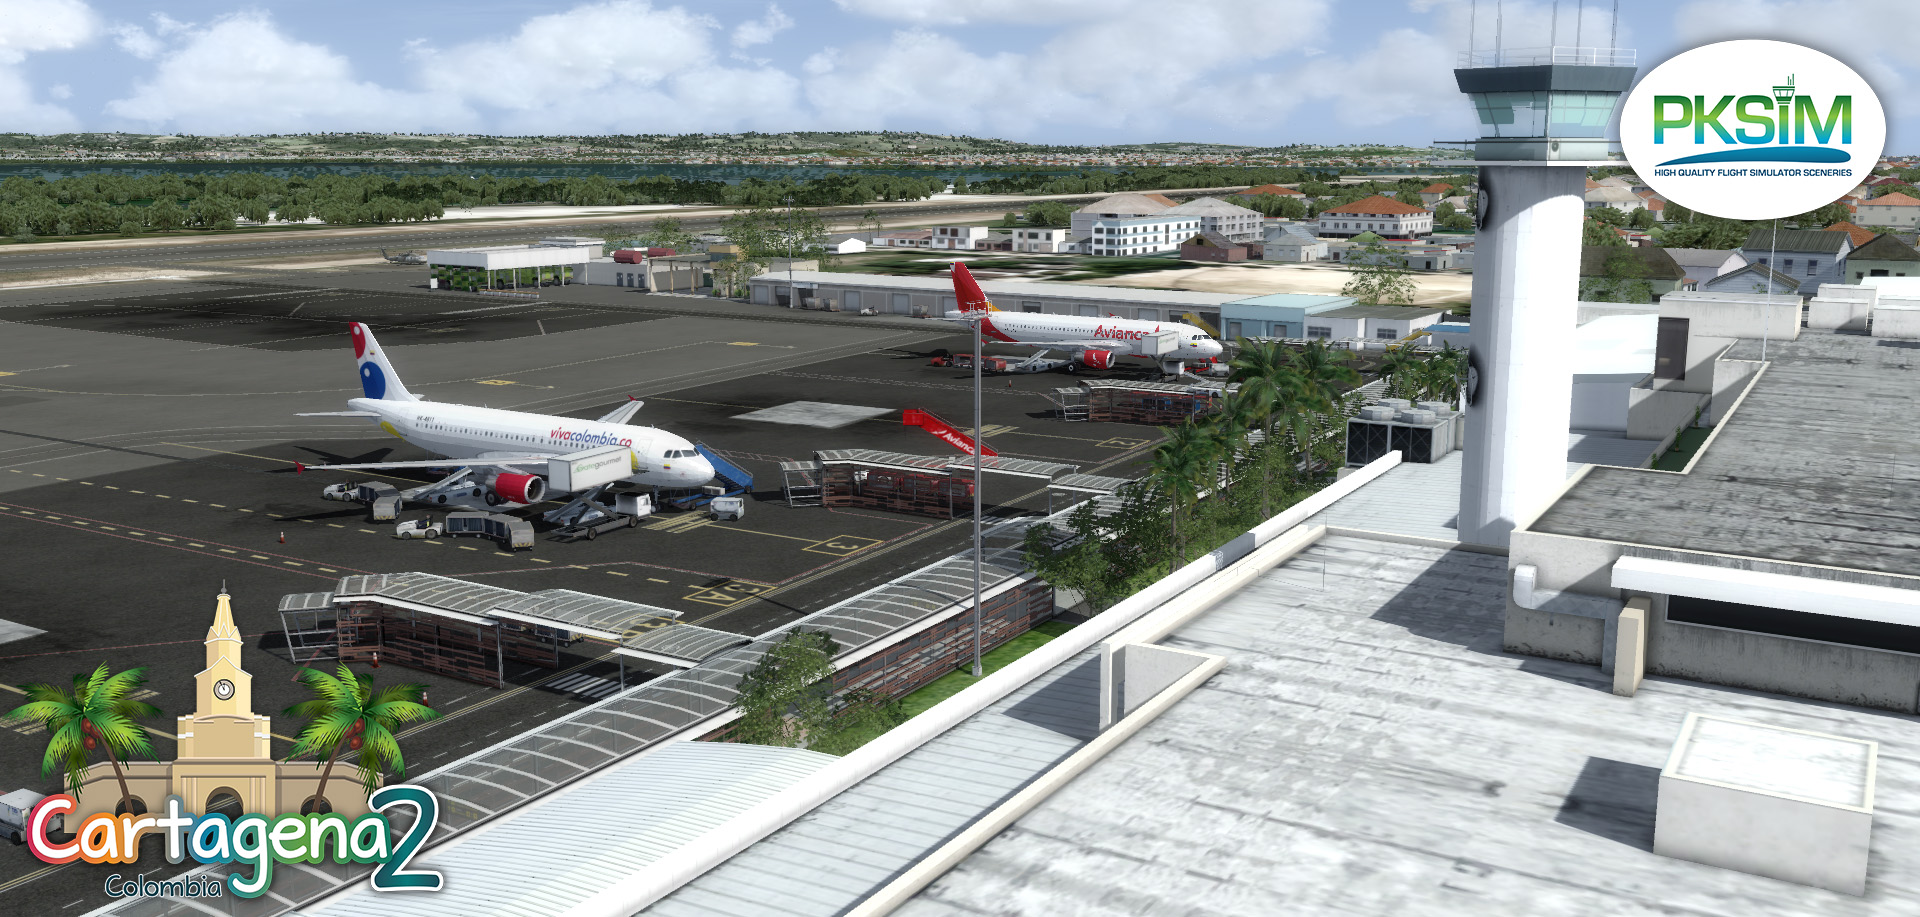 PKSIM :: High Quality Flight Simulator Sceneries